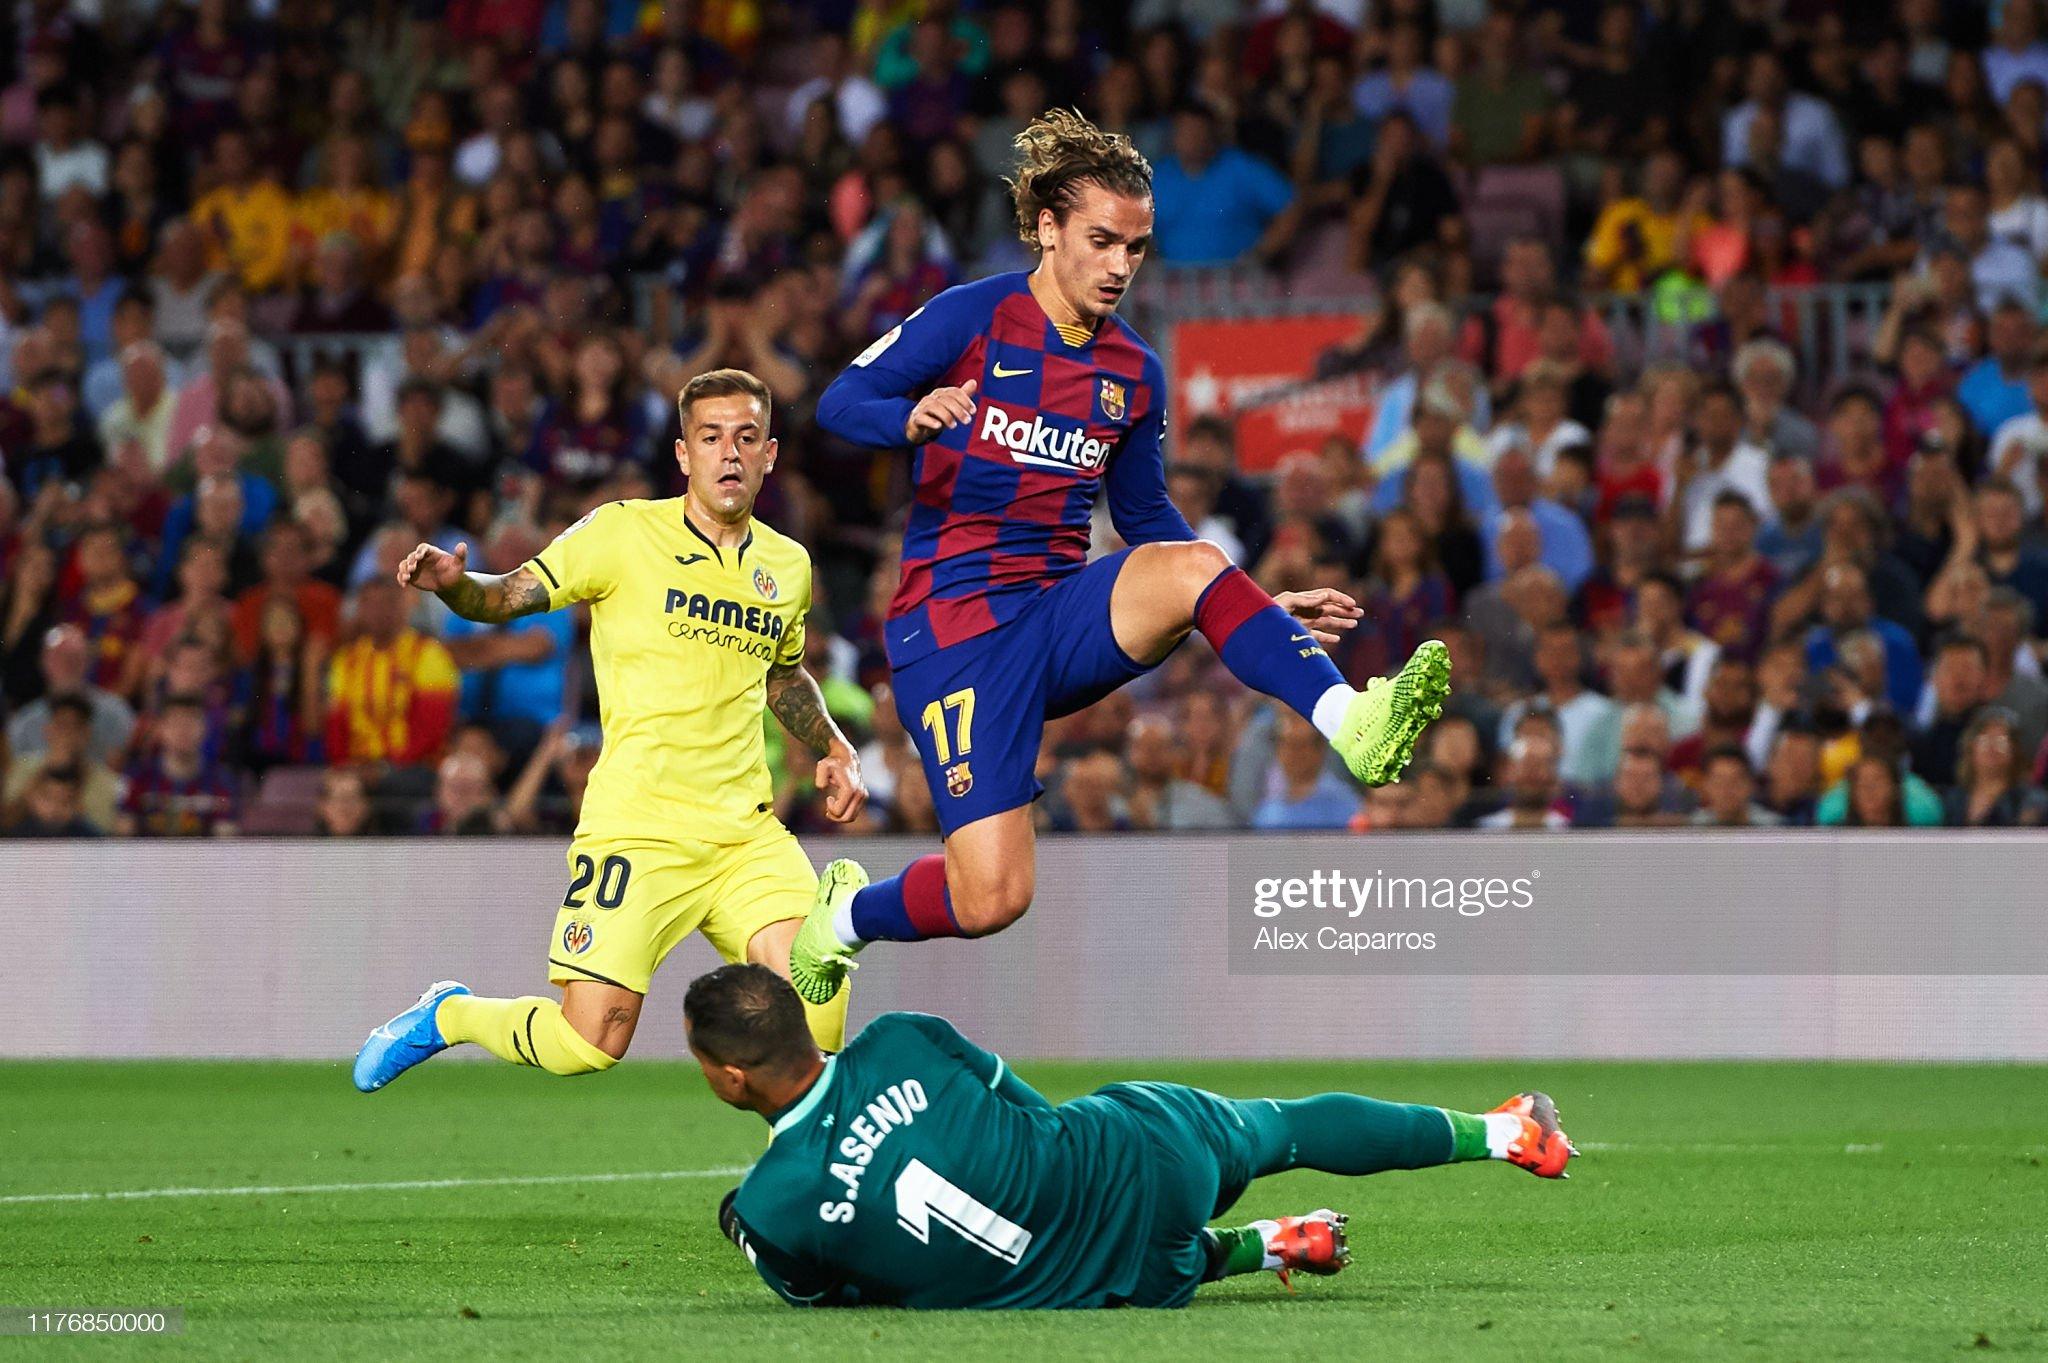 صور مباراة : برشلونة - فياريال 2-1 ( 24-09-2019 )  Antoine-griezmann-of-fc-barcelona-jumps-over-sergio-asenjo-of-cf-picture-id1176850000?s=2048x2048